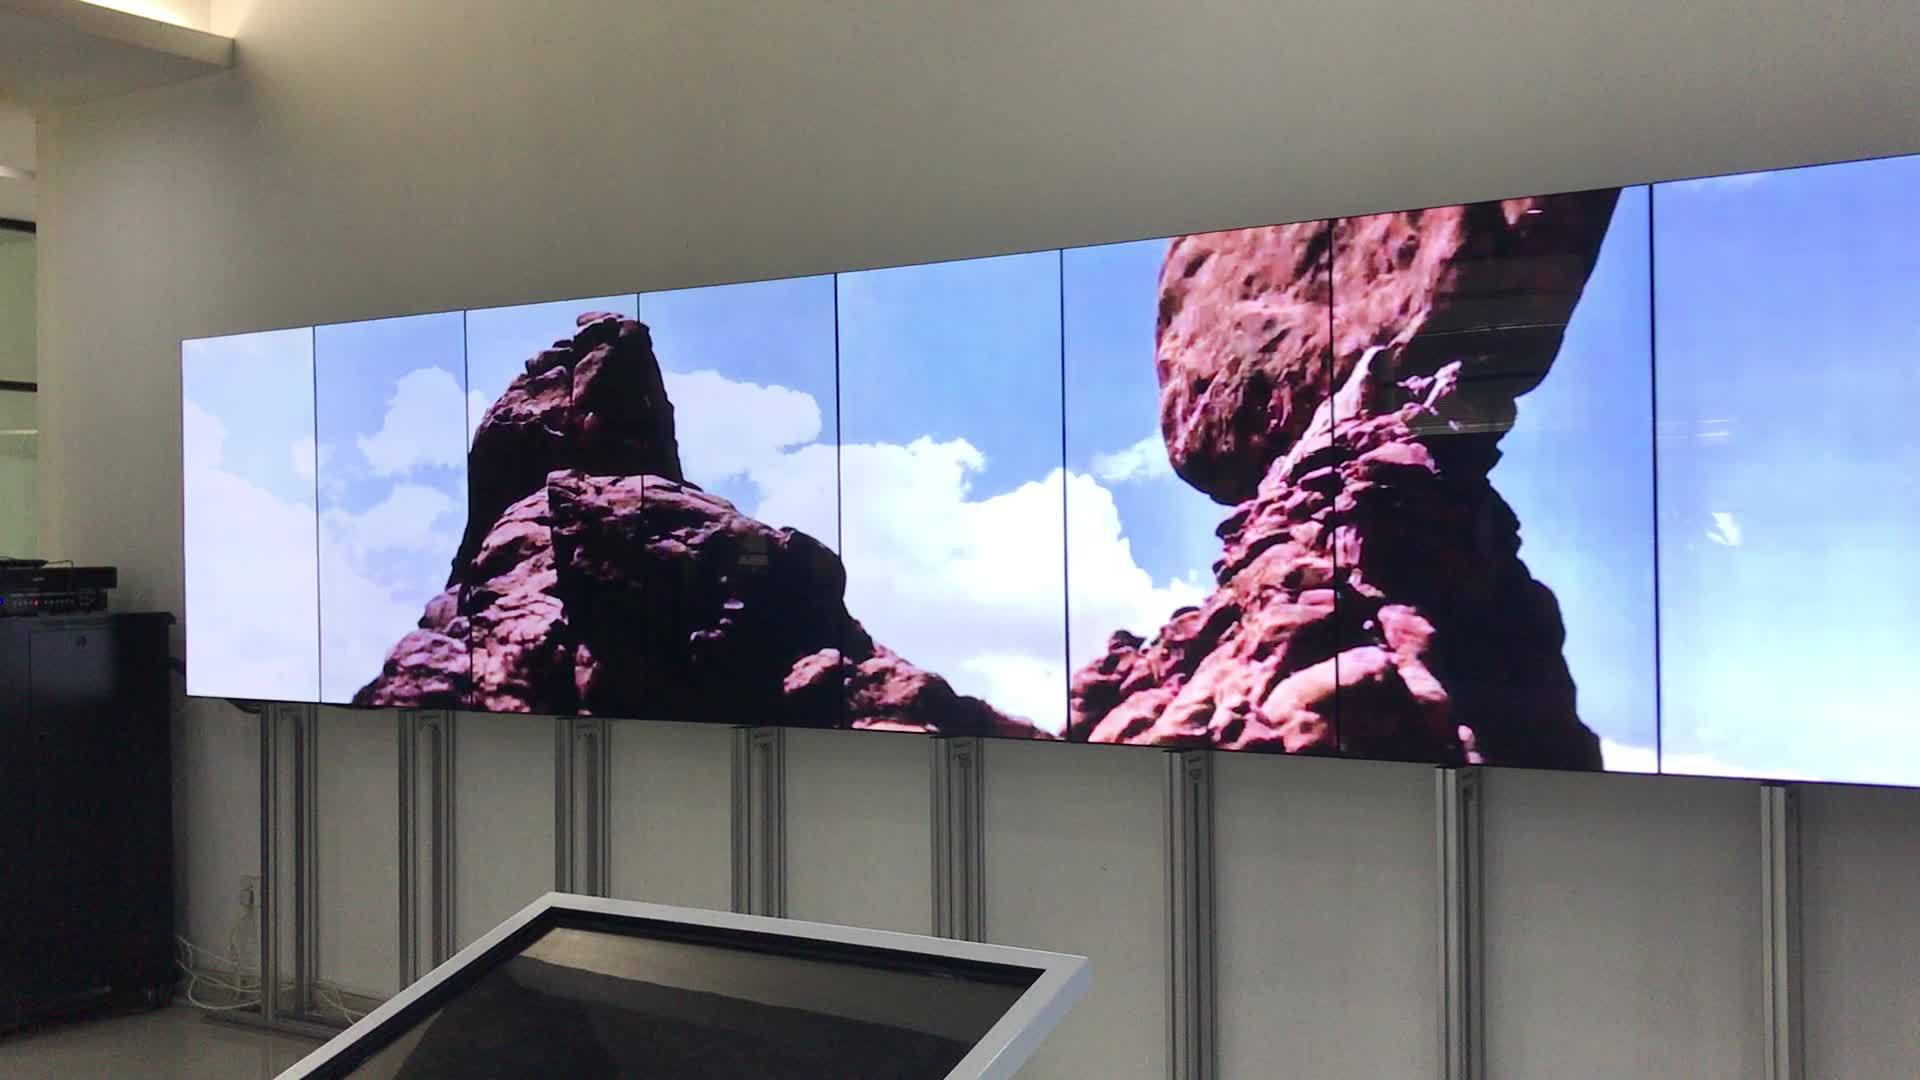 55 polegadas 4x4 ultra narrow bezel montagem videowall publicidade tv monitor multi screen display de parede de vídeo lcd